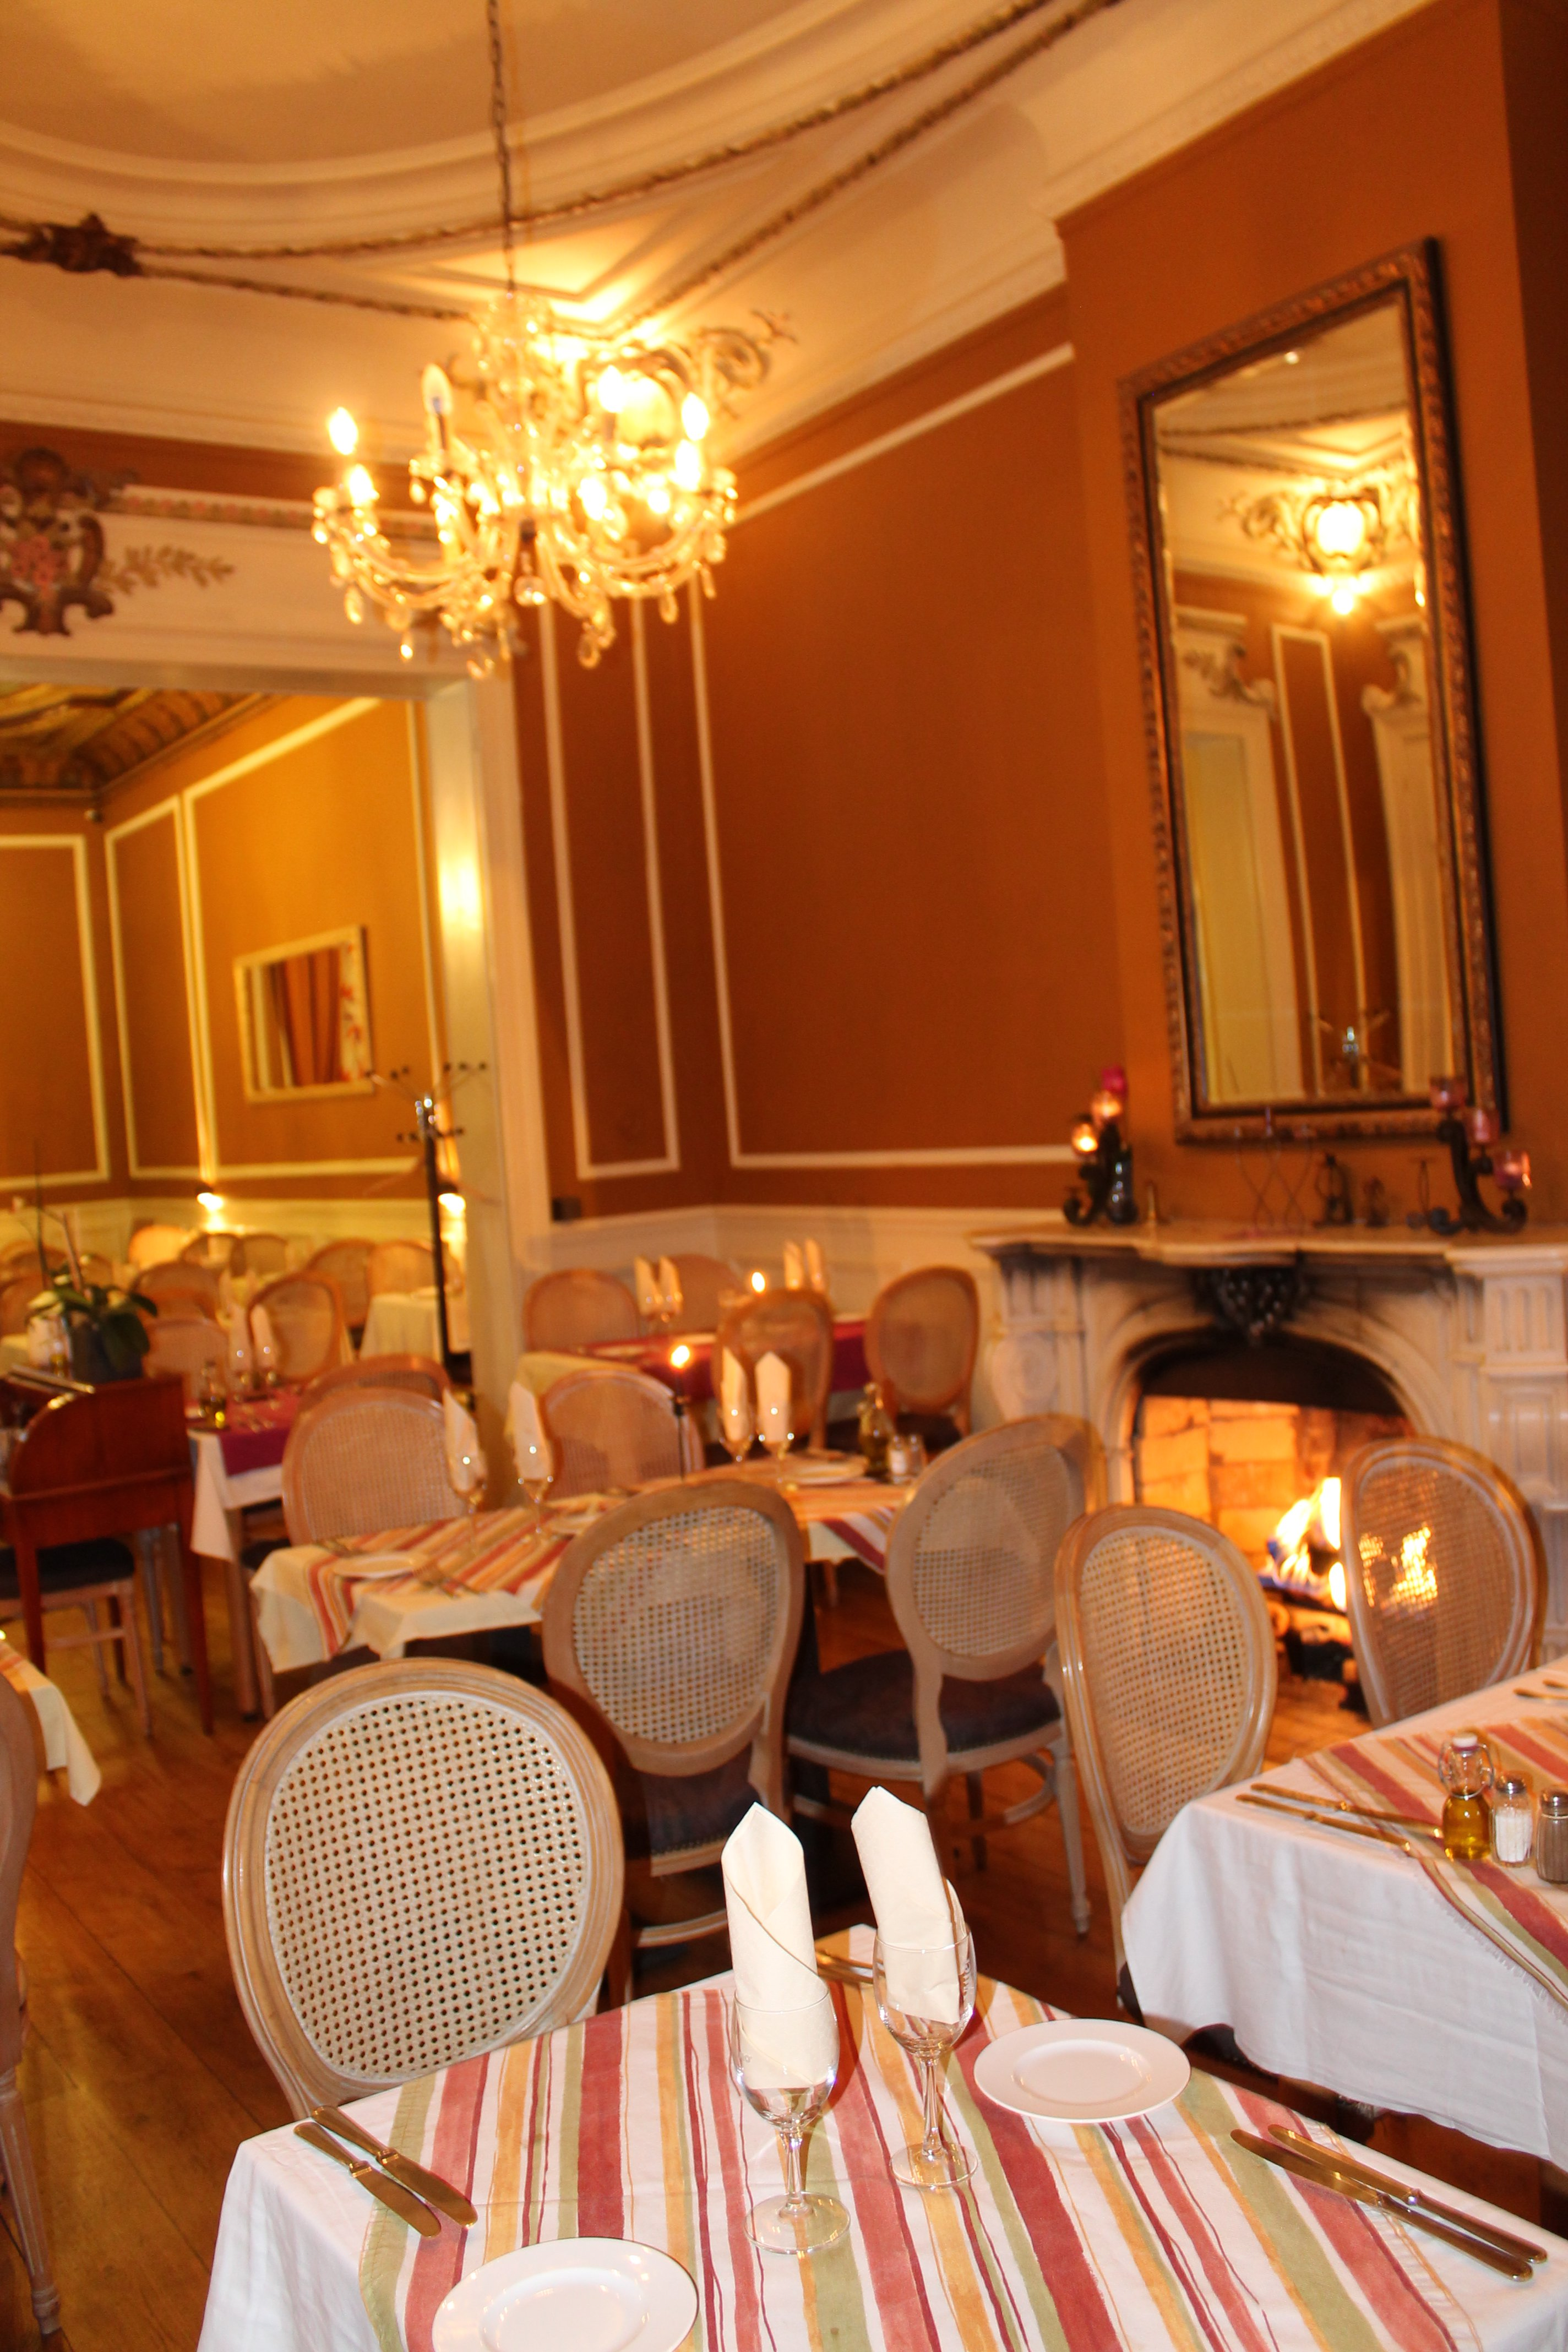 Brussels Grill Restaurant Saint Josse Ten Noode